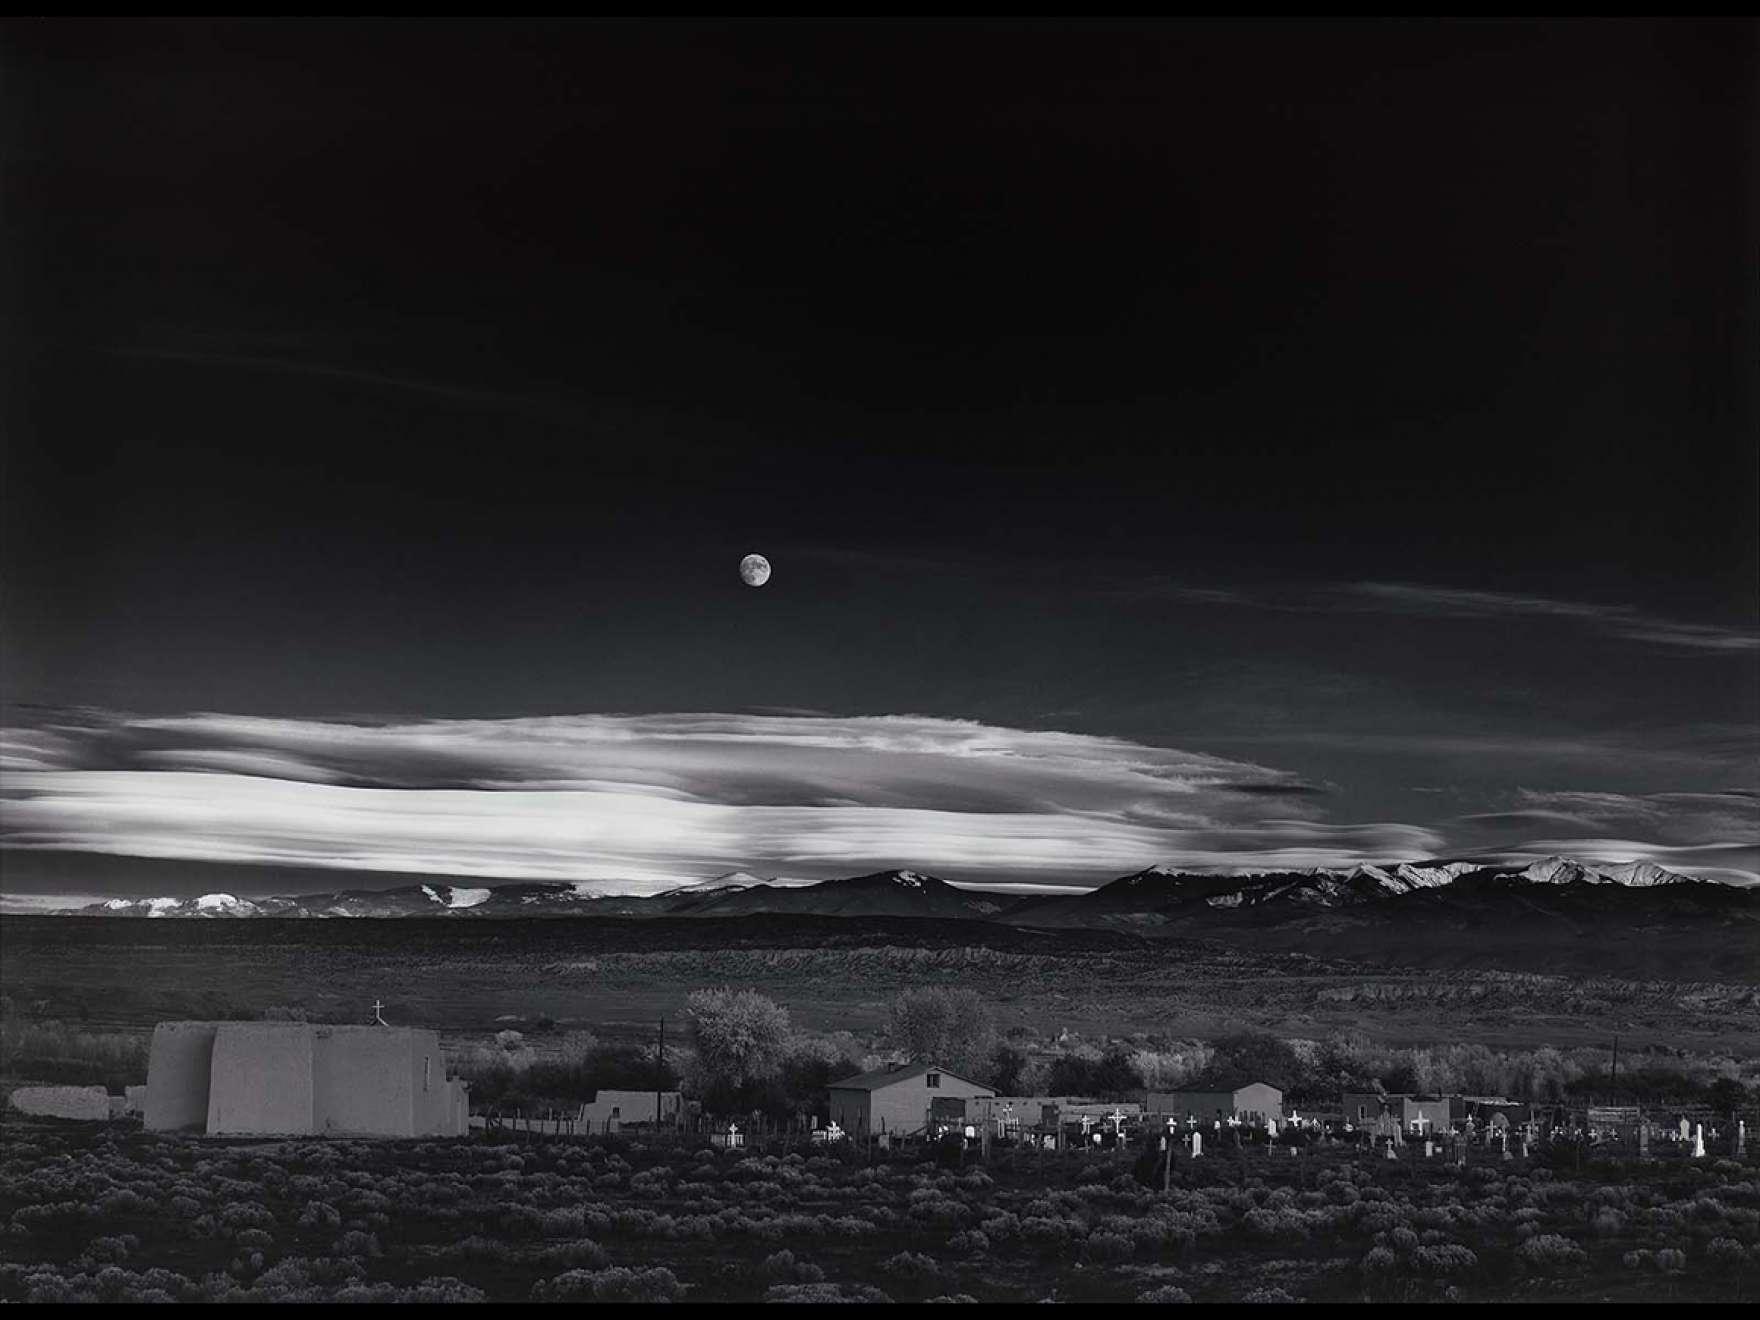 Ansel Adams's photograph, Moonrise, Hernandez, New Mexico